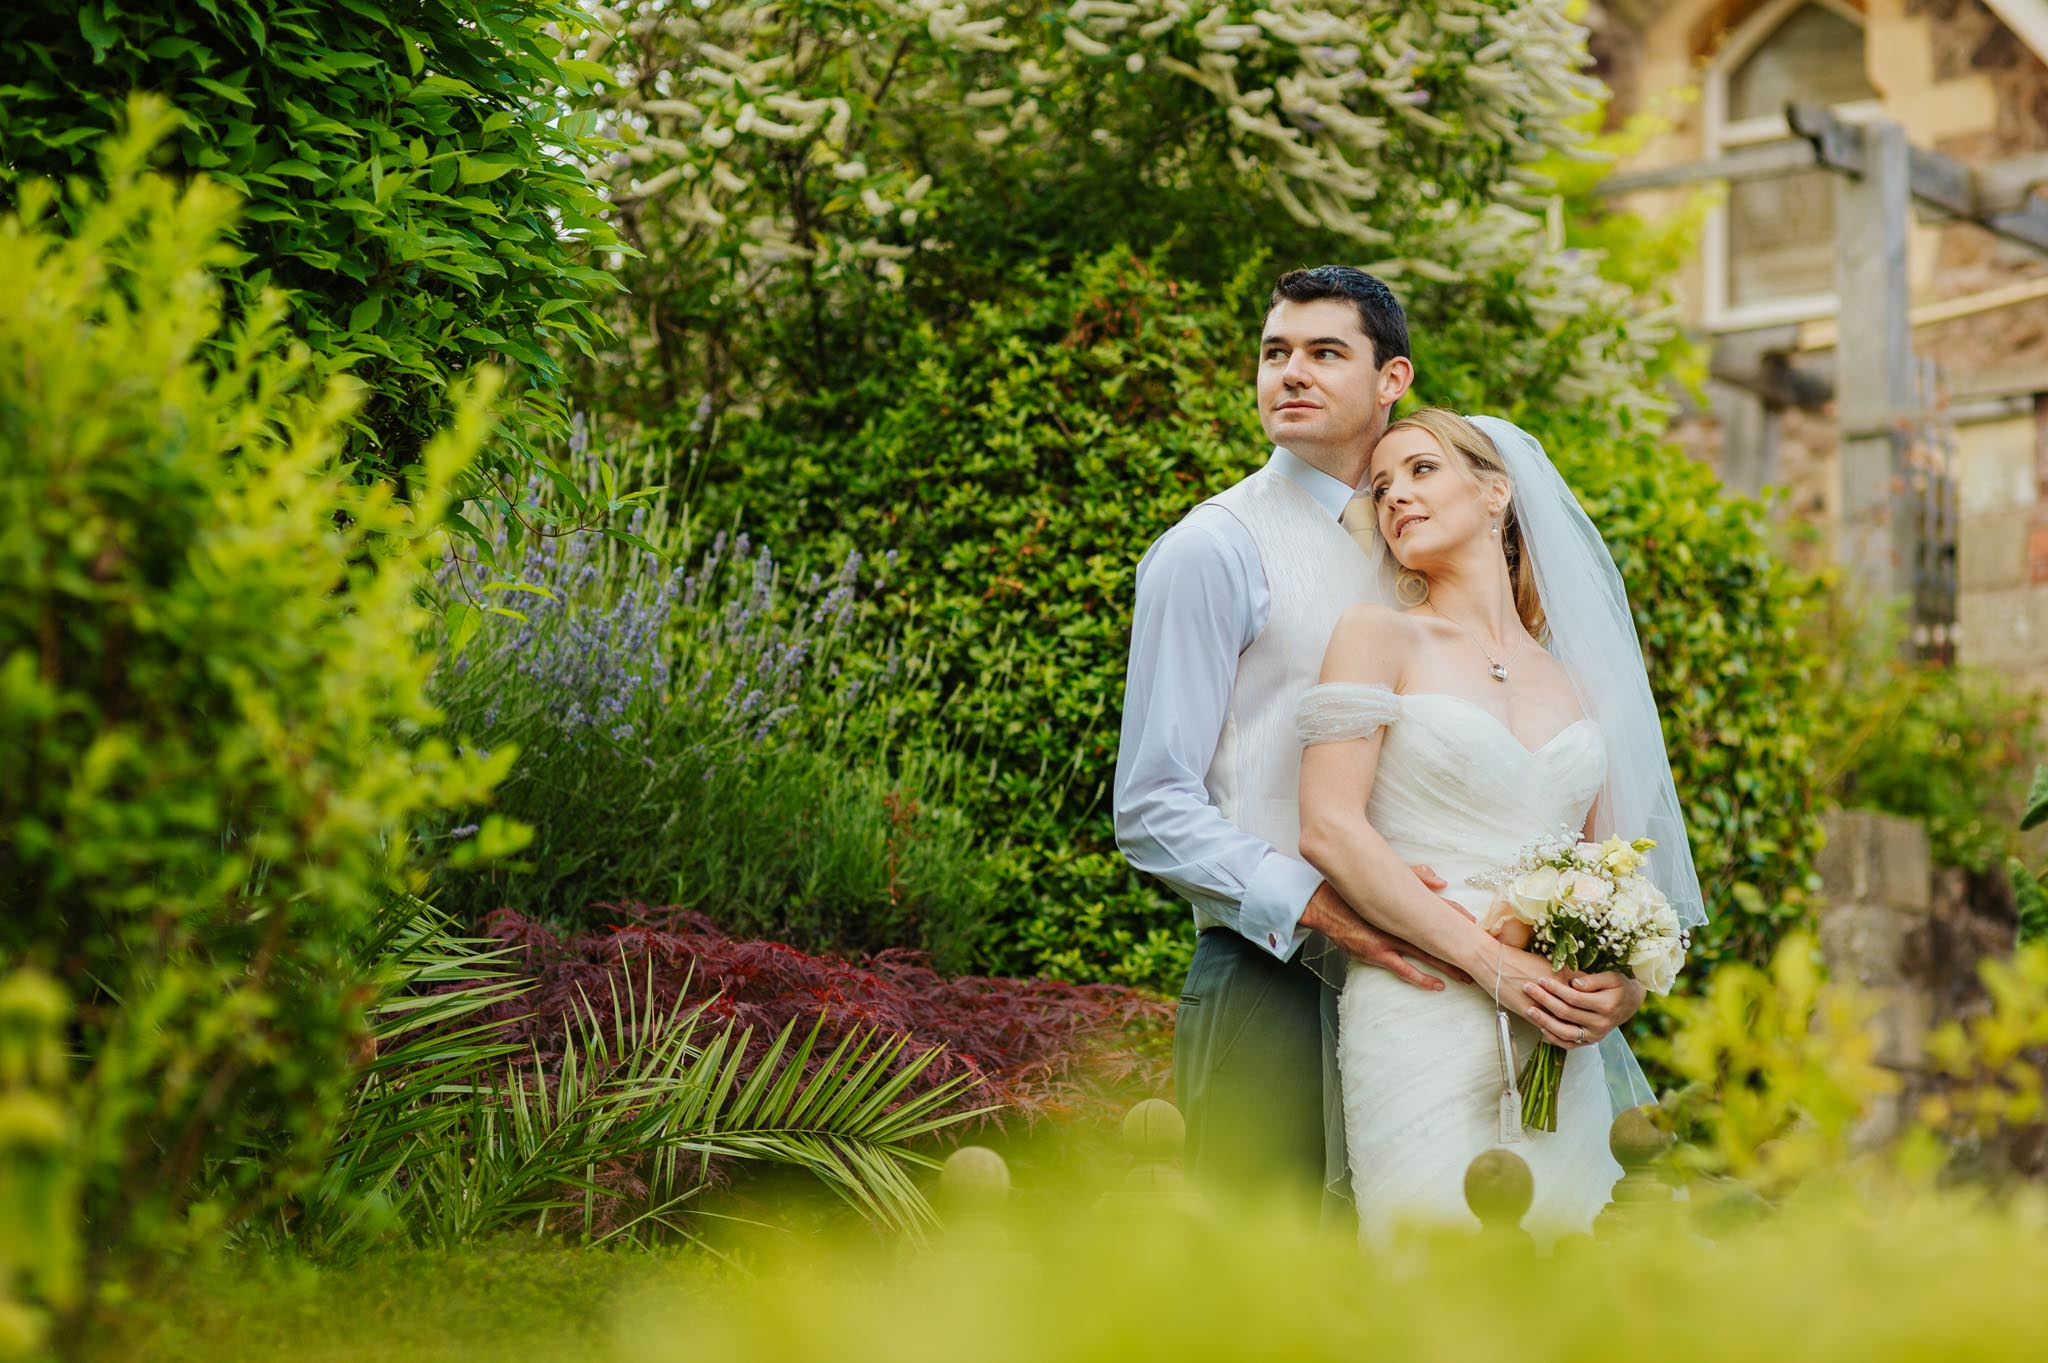 Georgina + Mike - Wedding photography in Malvern, Worcestershire 75